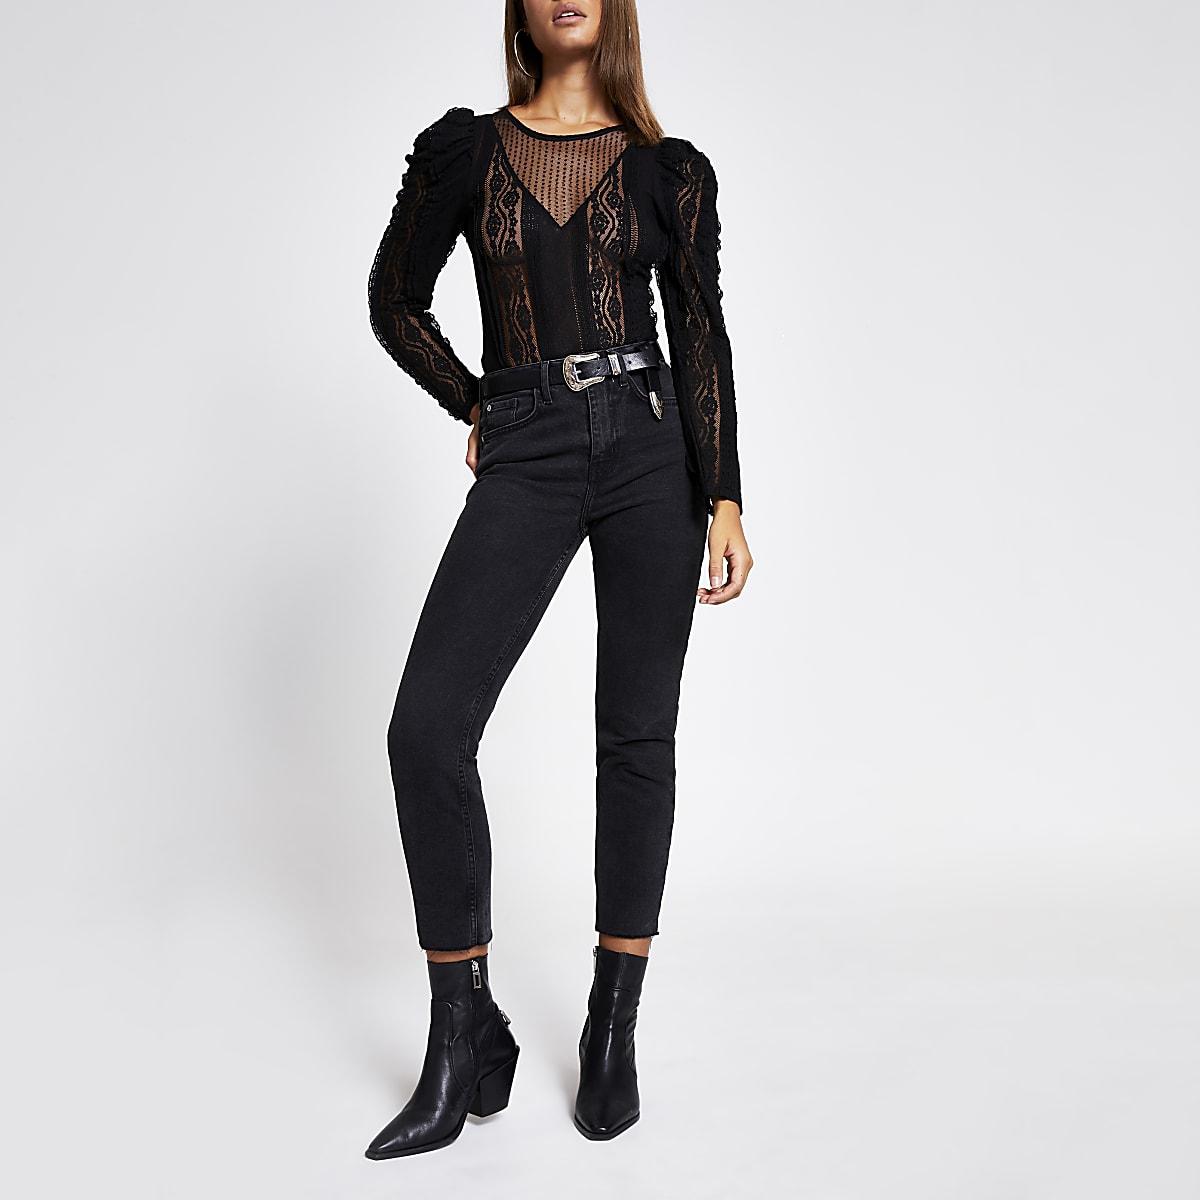 Black sheer lace long sleeve bodysuit